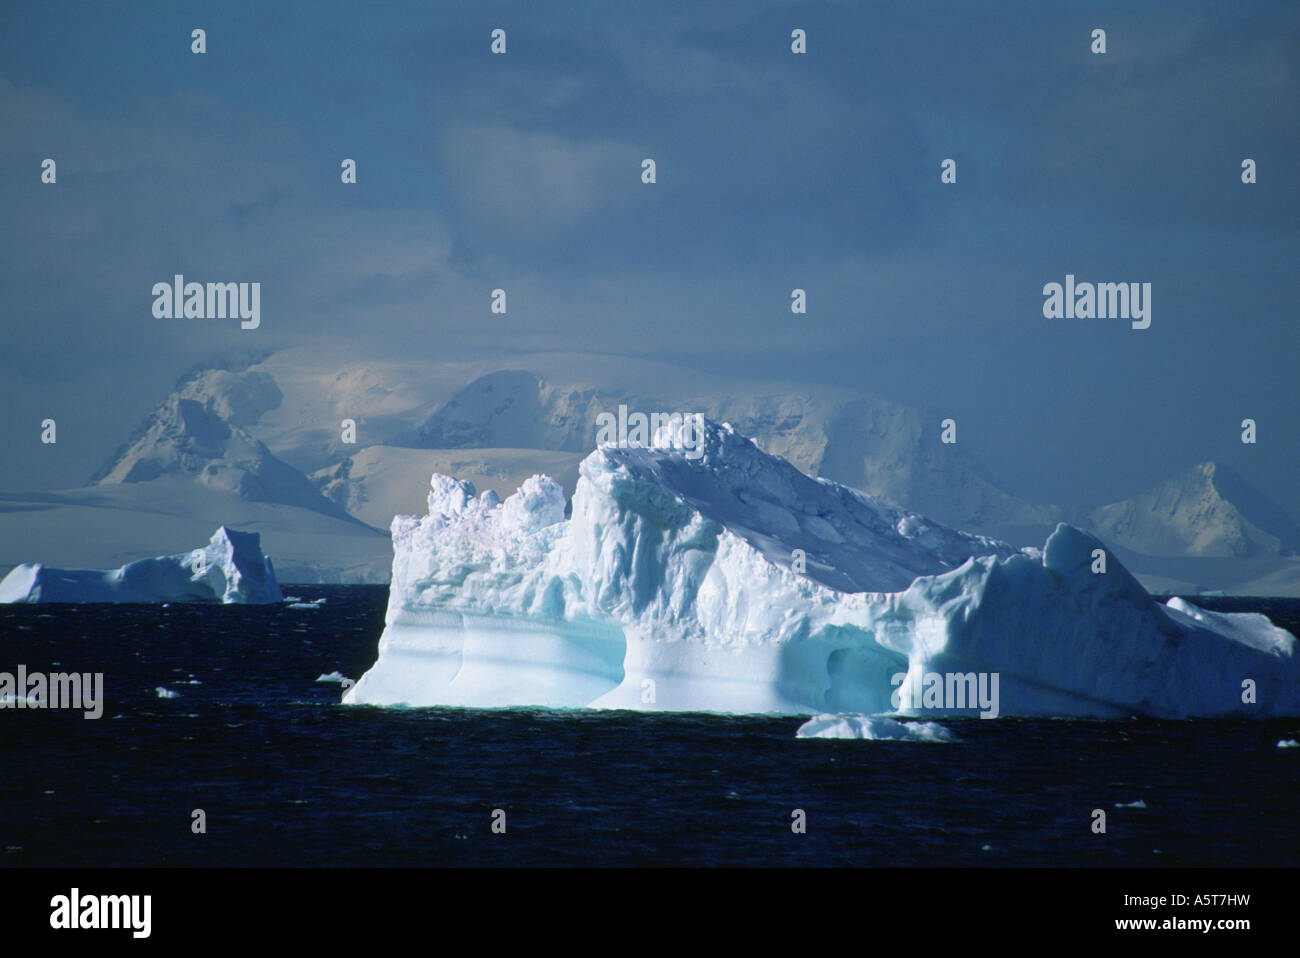 Iceberg in the Neumayer Channel Antarctica - Stock Image